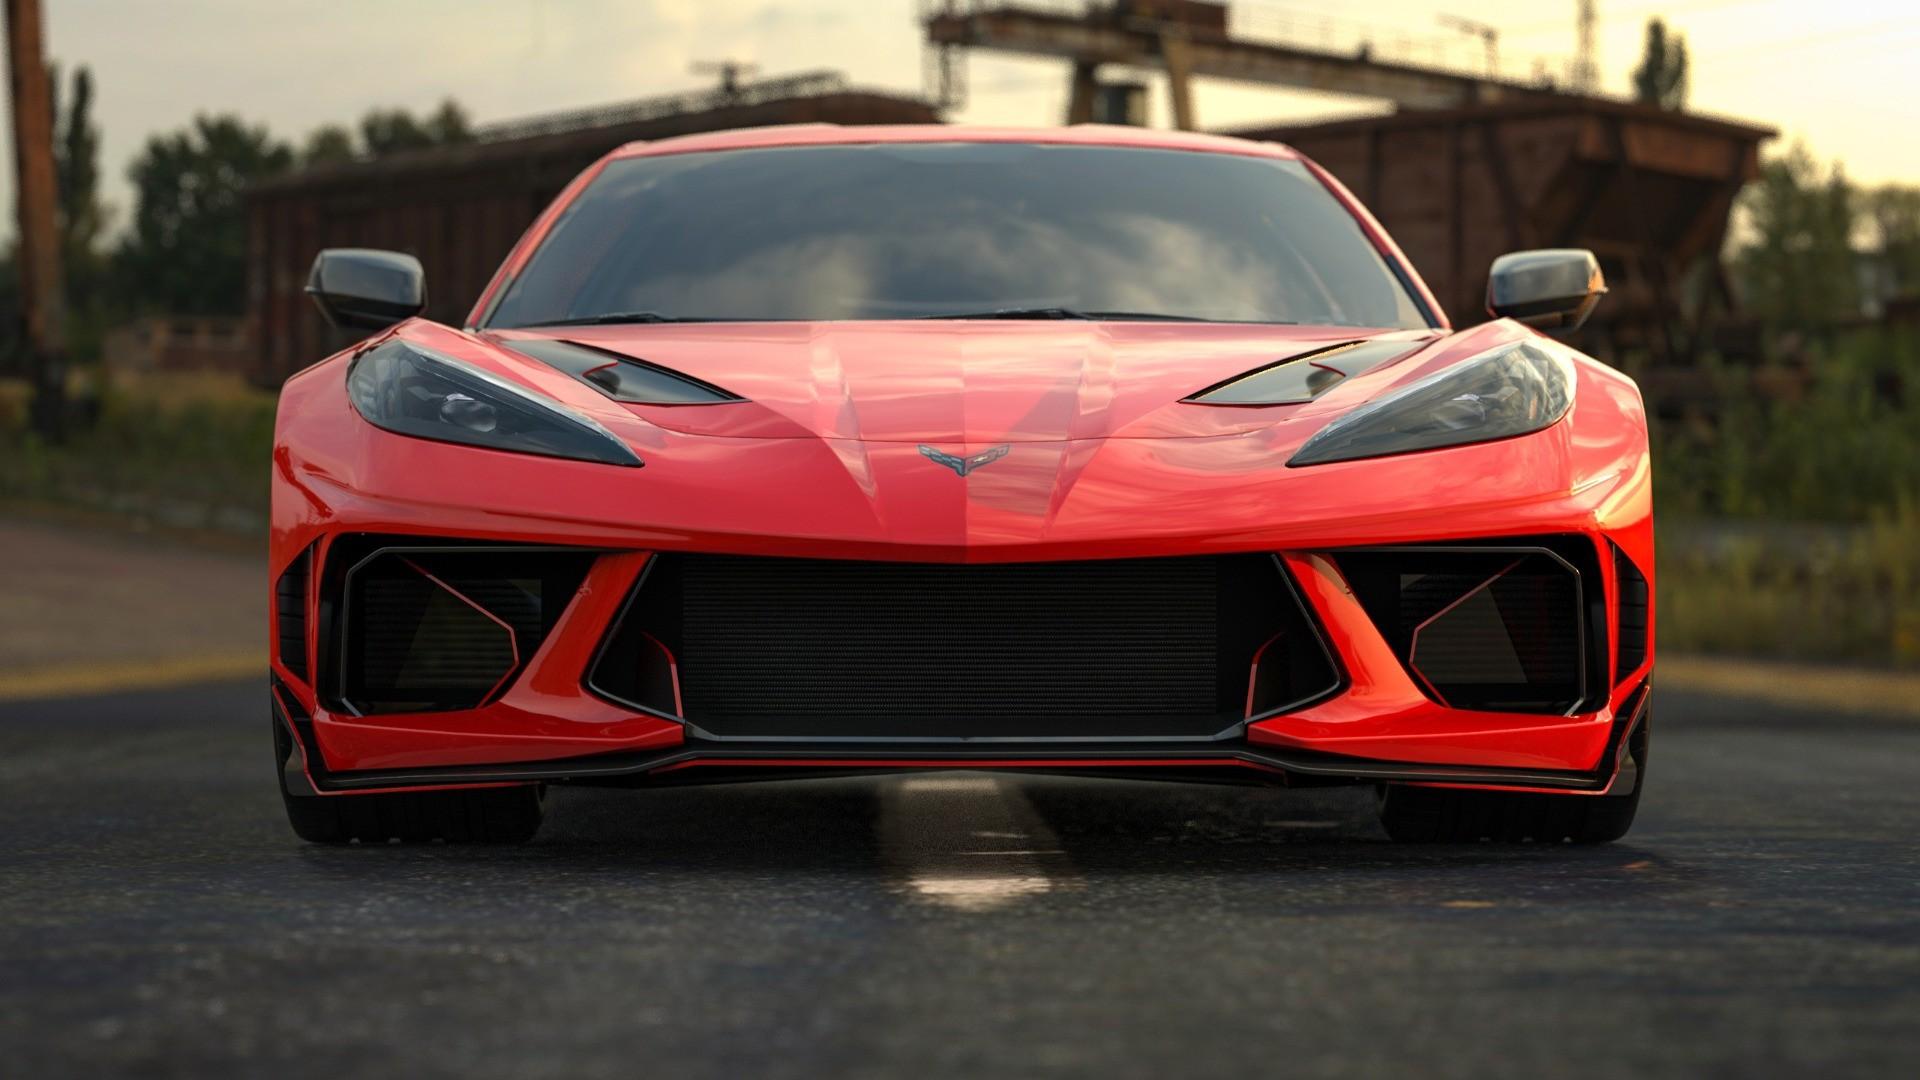 Chevrolet-Corvette-Centurion-by-Alandi-Motors-3